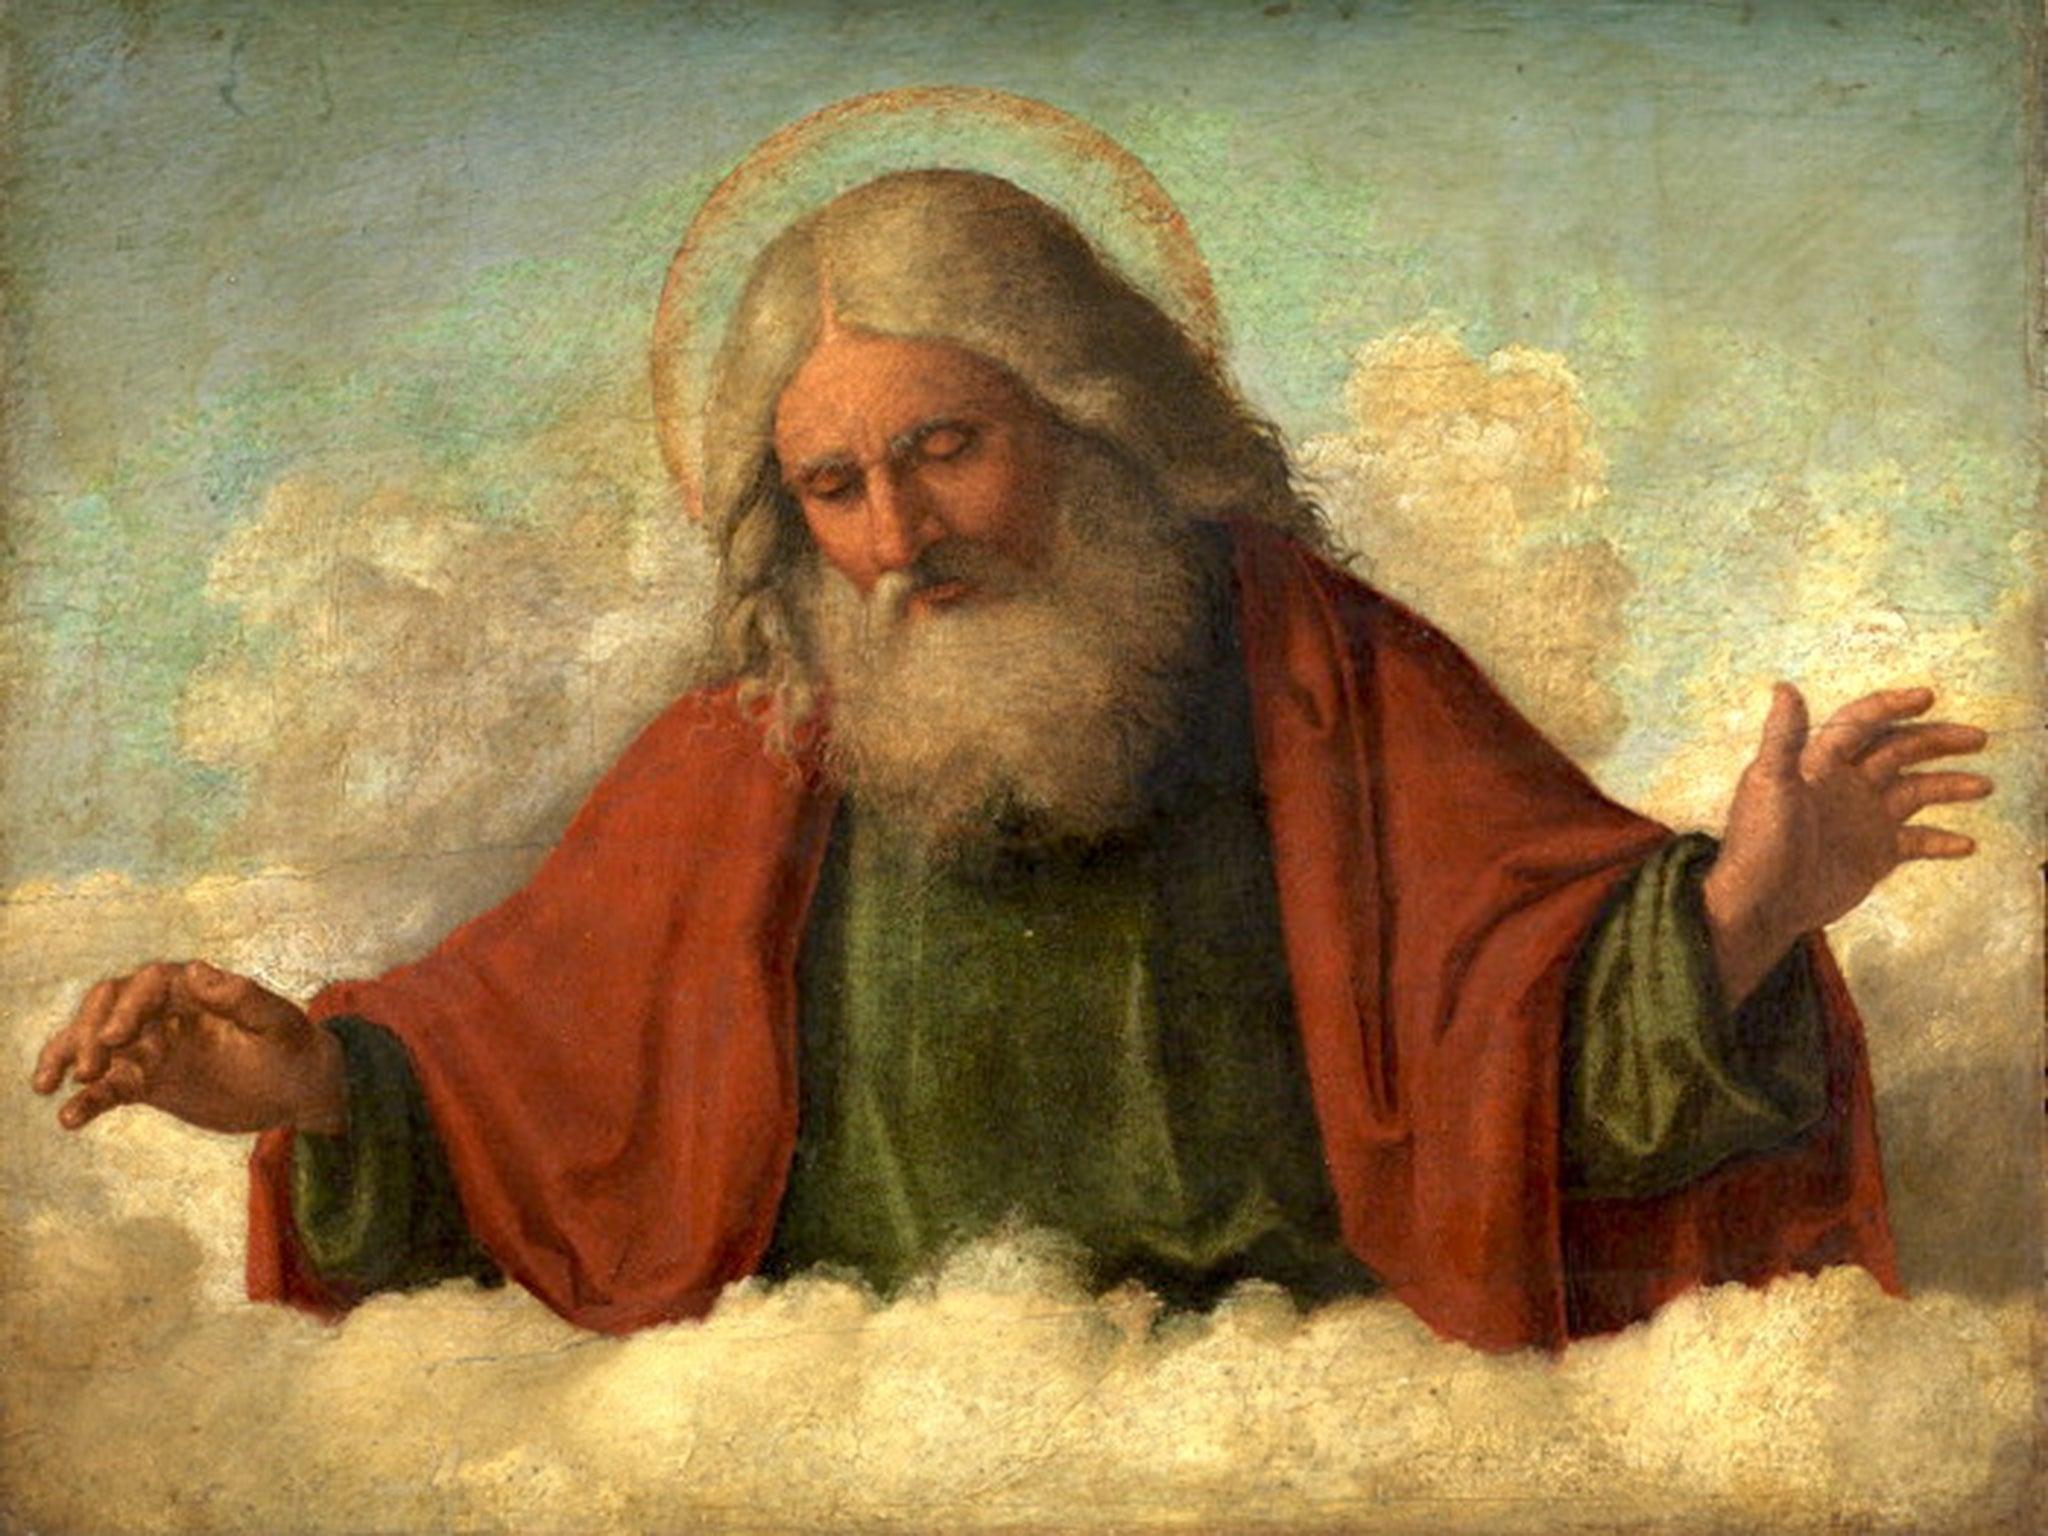 Man seeks restraining order against God